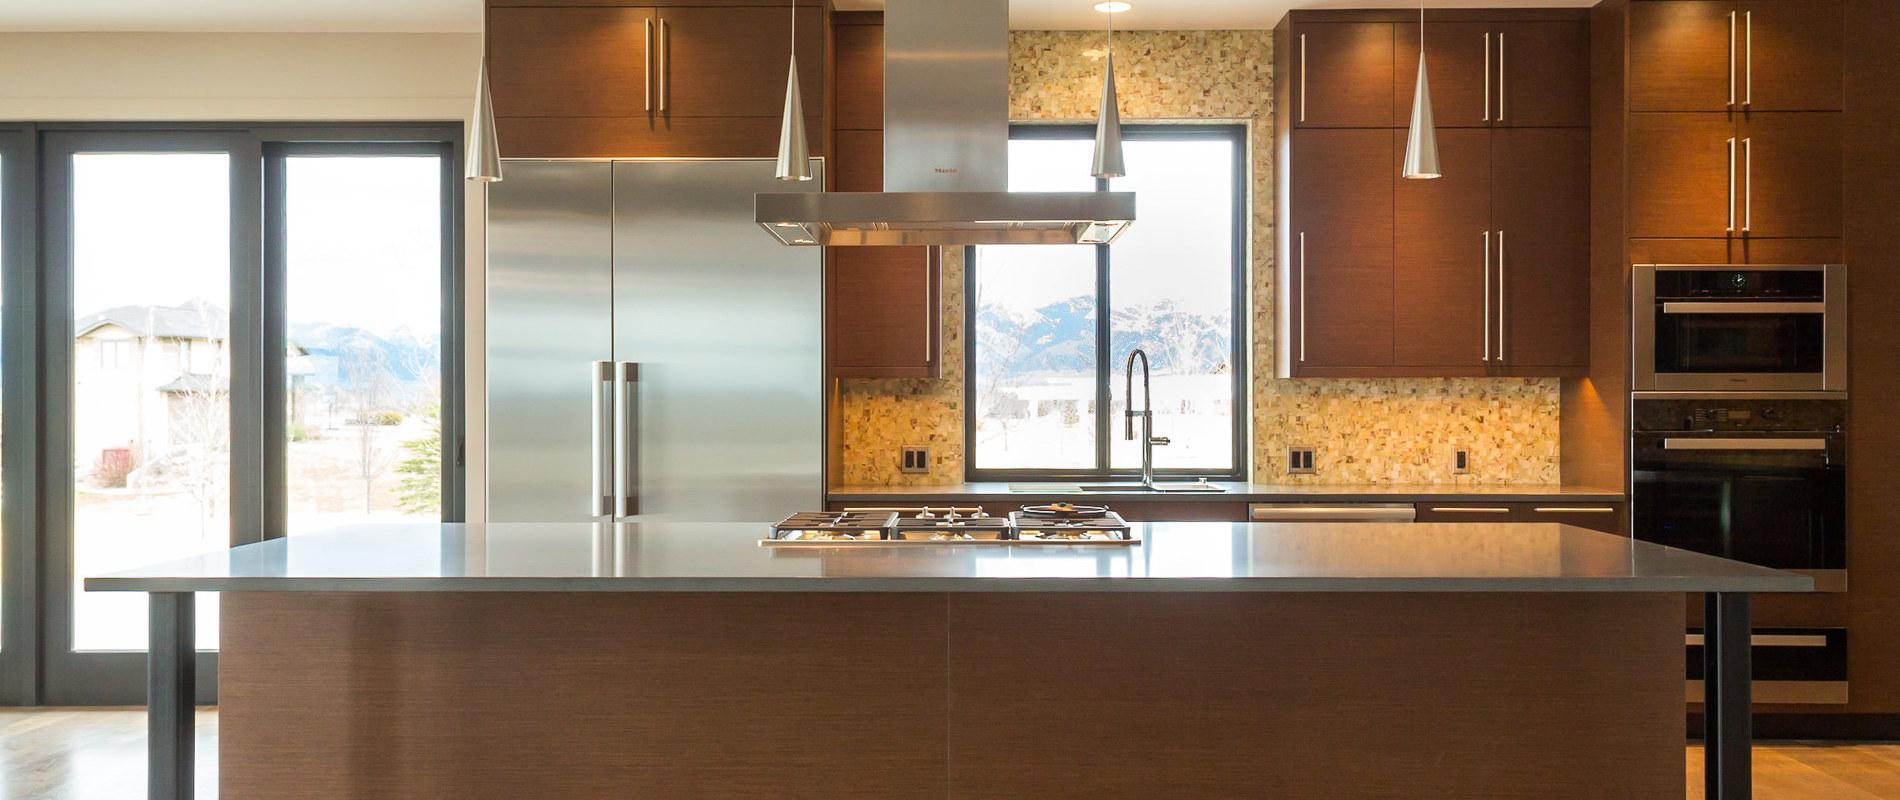 Bozeman, MT Kitchen Cabinets | Cabinets, Countertops, Accessories ...